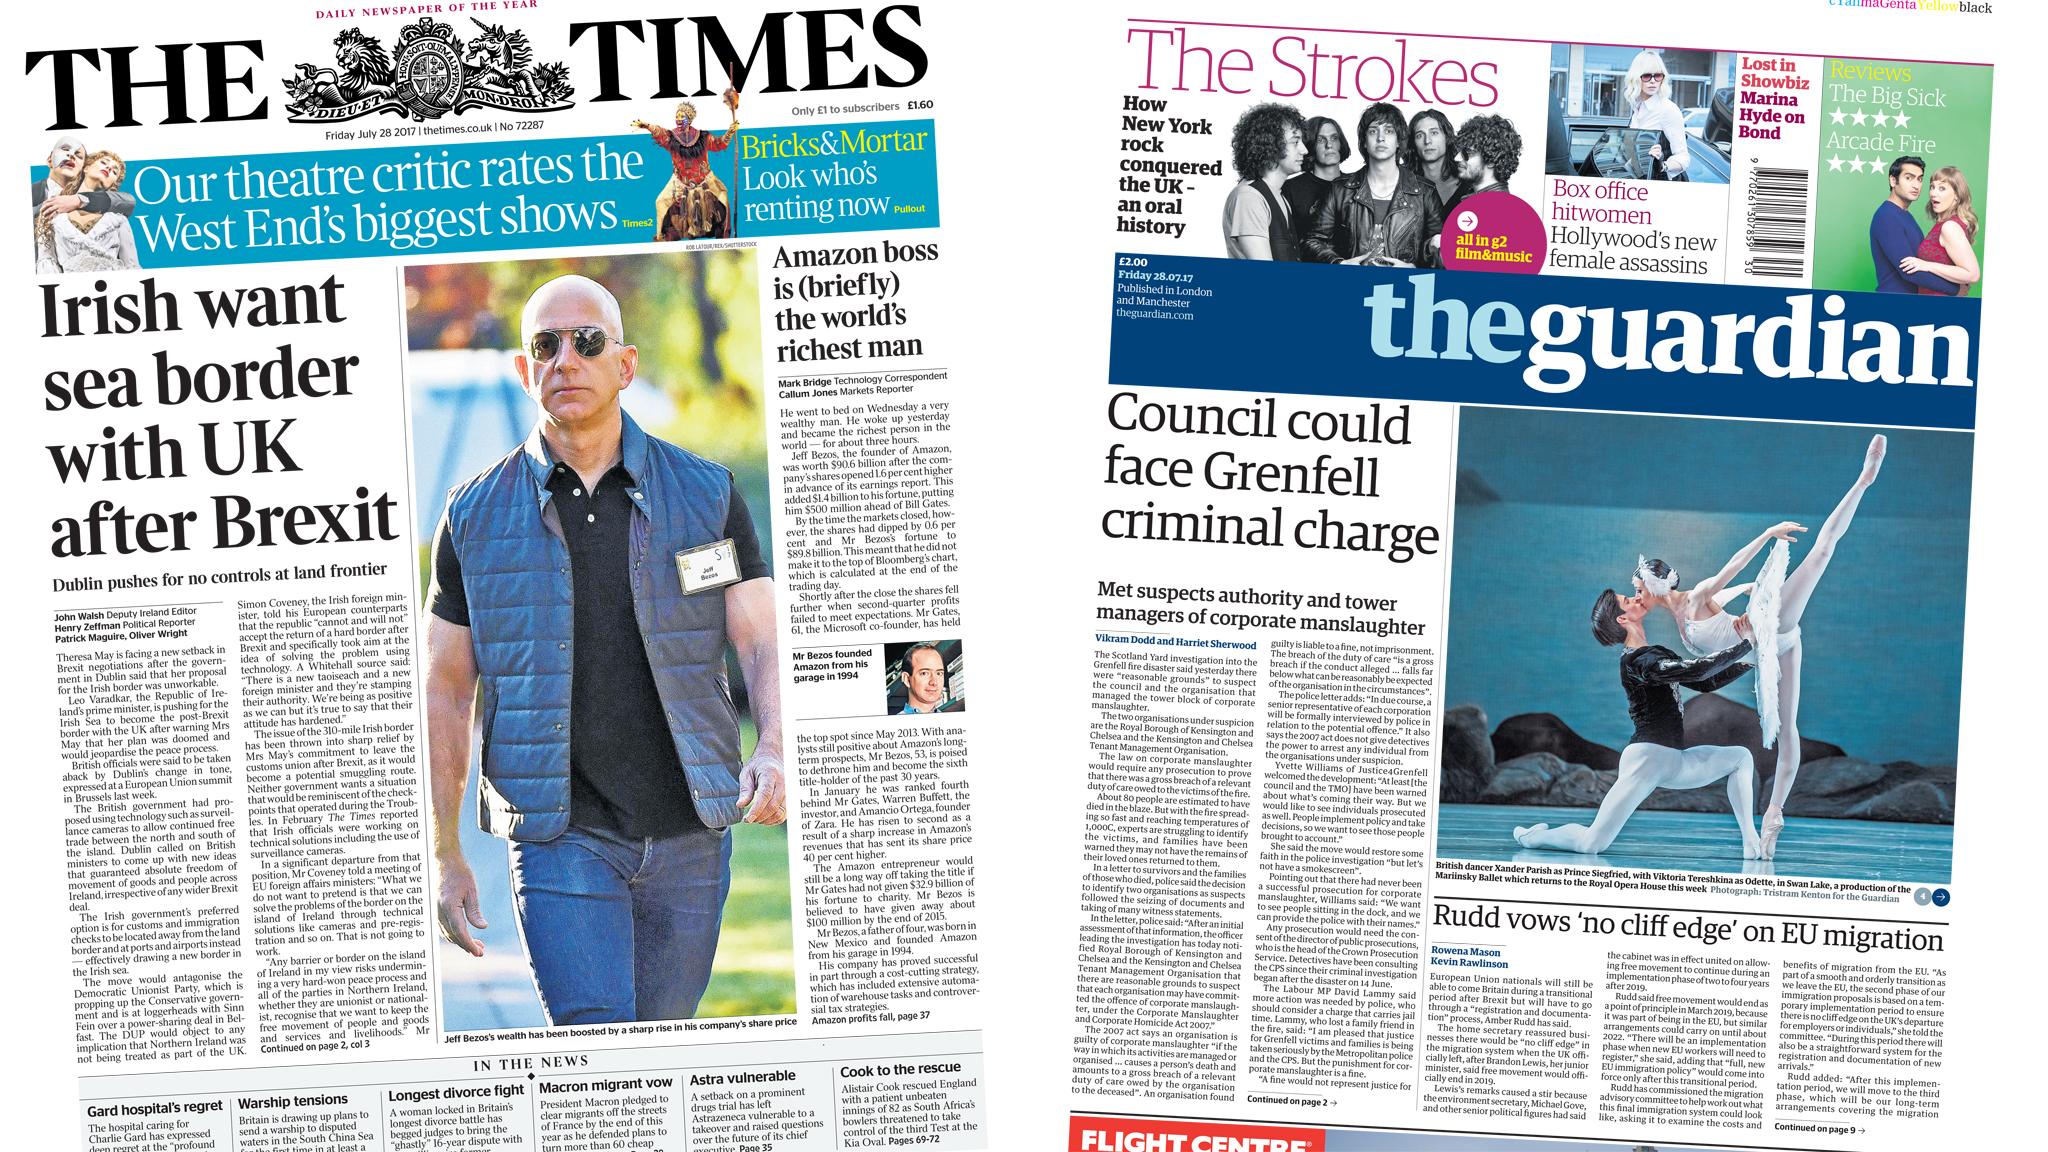 Newspaper headlines: Irish border 'setback' and Grenfell manslaughter probe